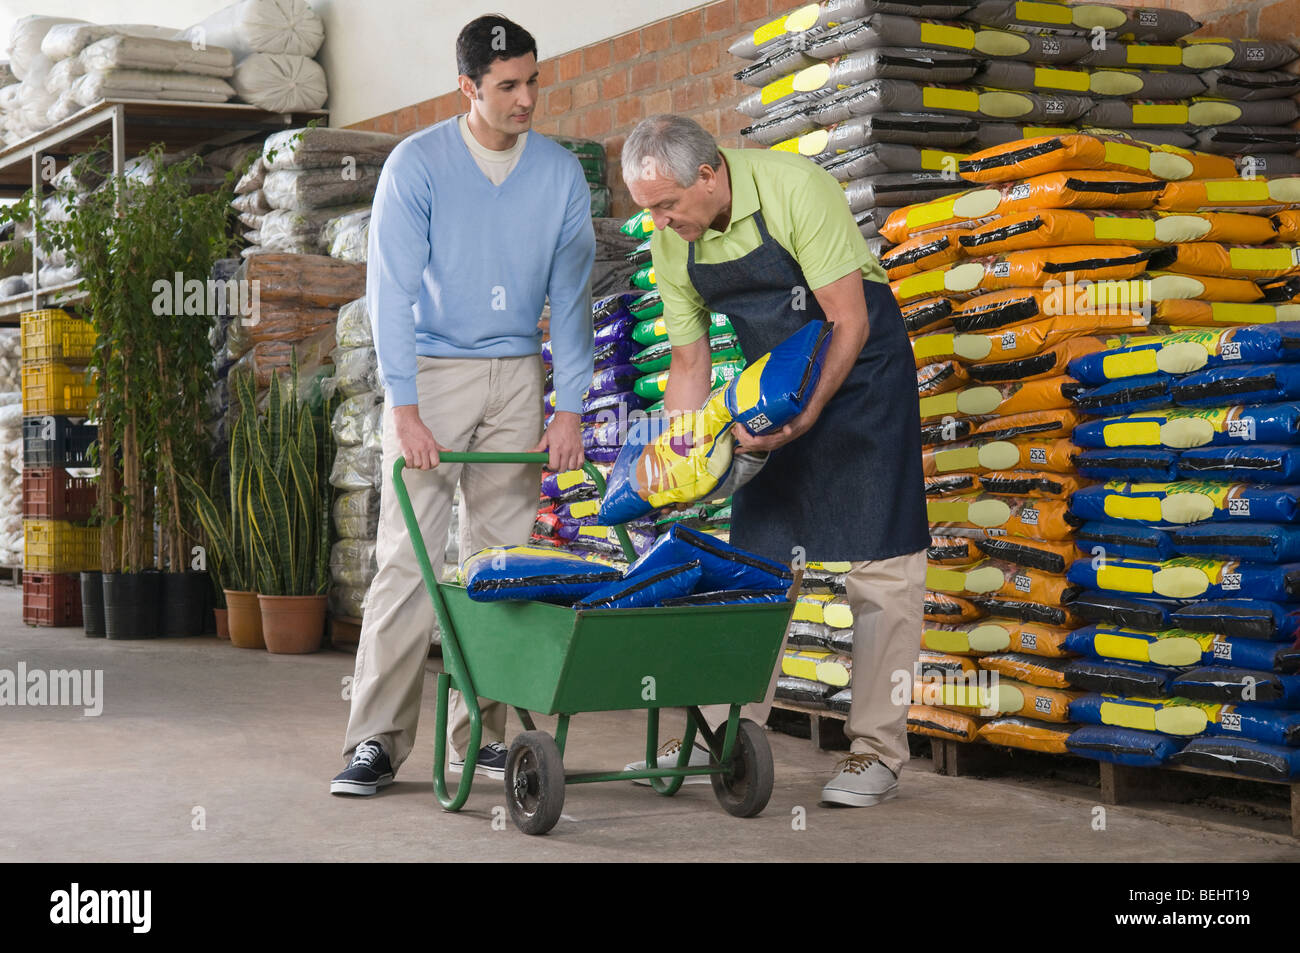 s clerk arranging fertilizer s bag in shopping cart stock s clerk arranging fertilizer s bag in shopping cart